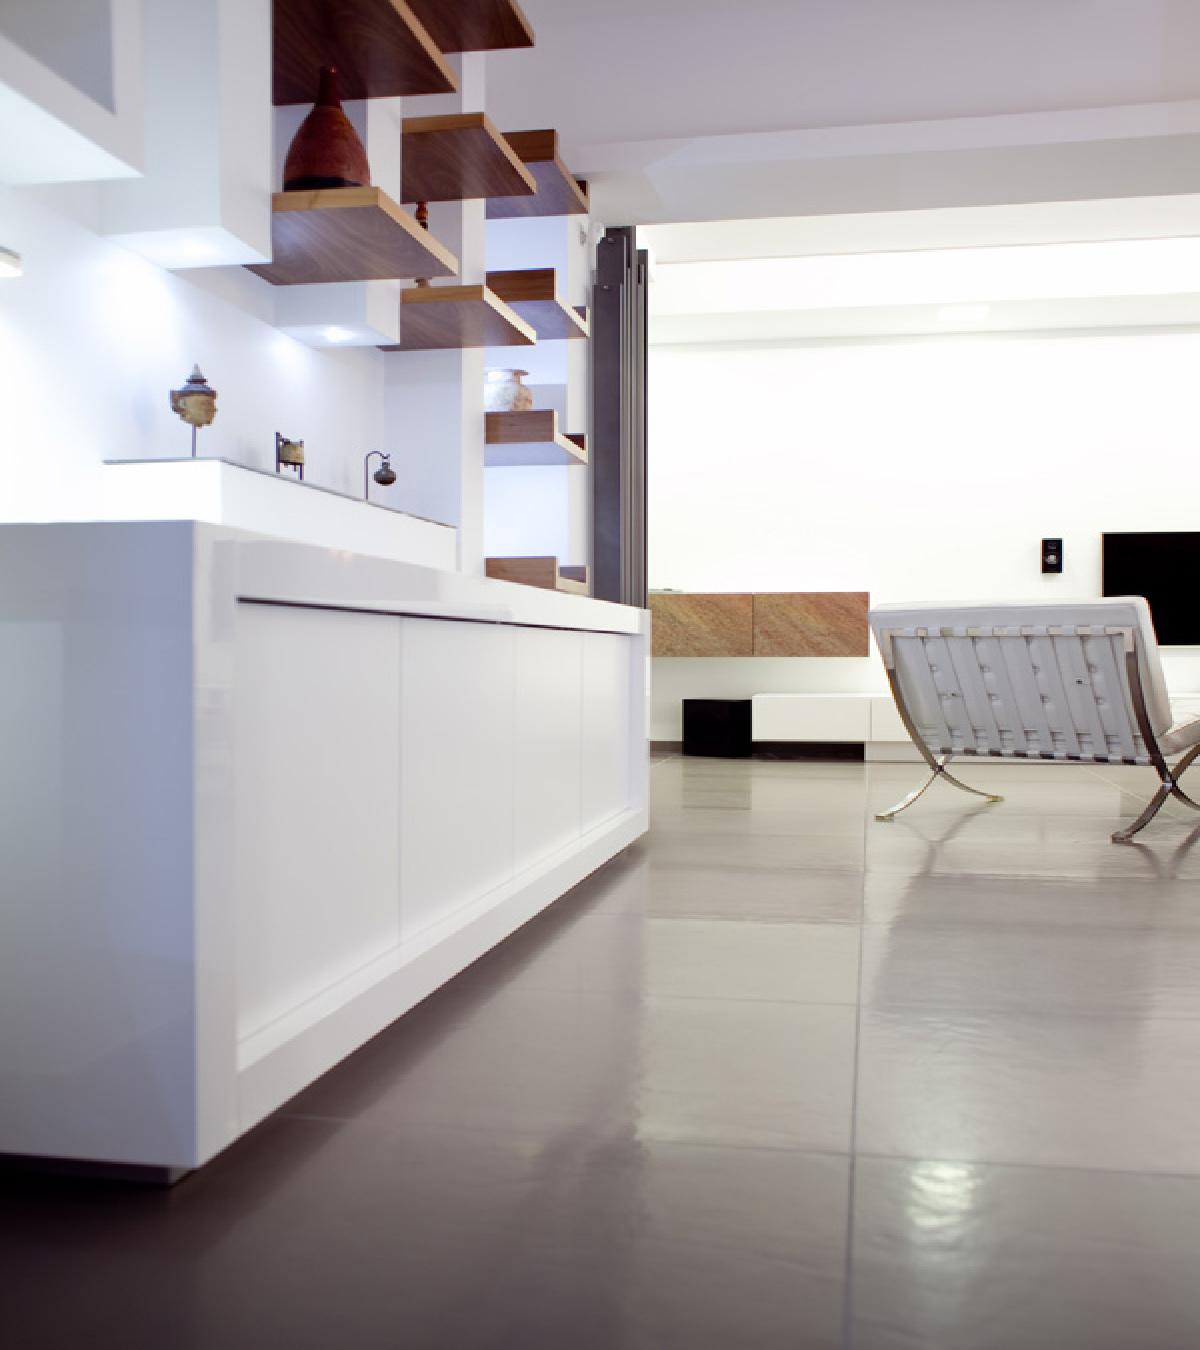 Eiffelgres gres porcelanico baldosas para pavimentos y for Encimera gres porcelanico